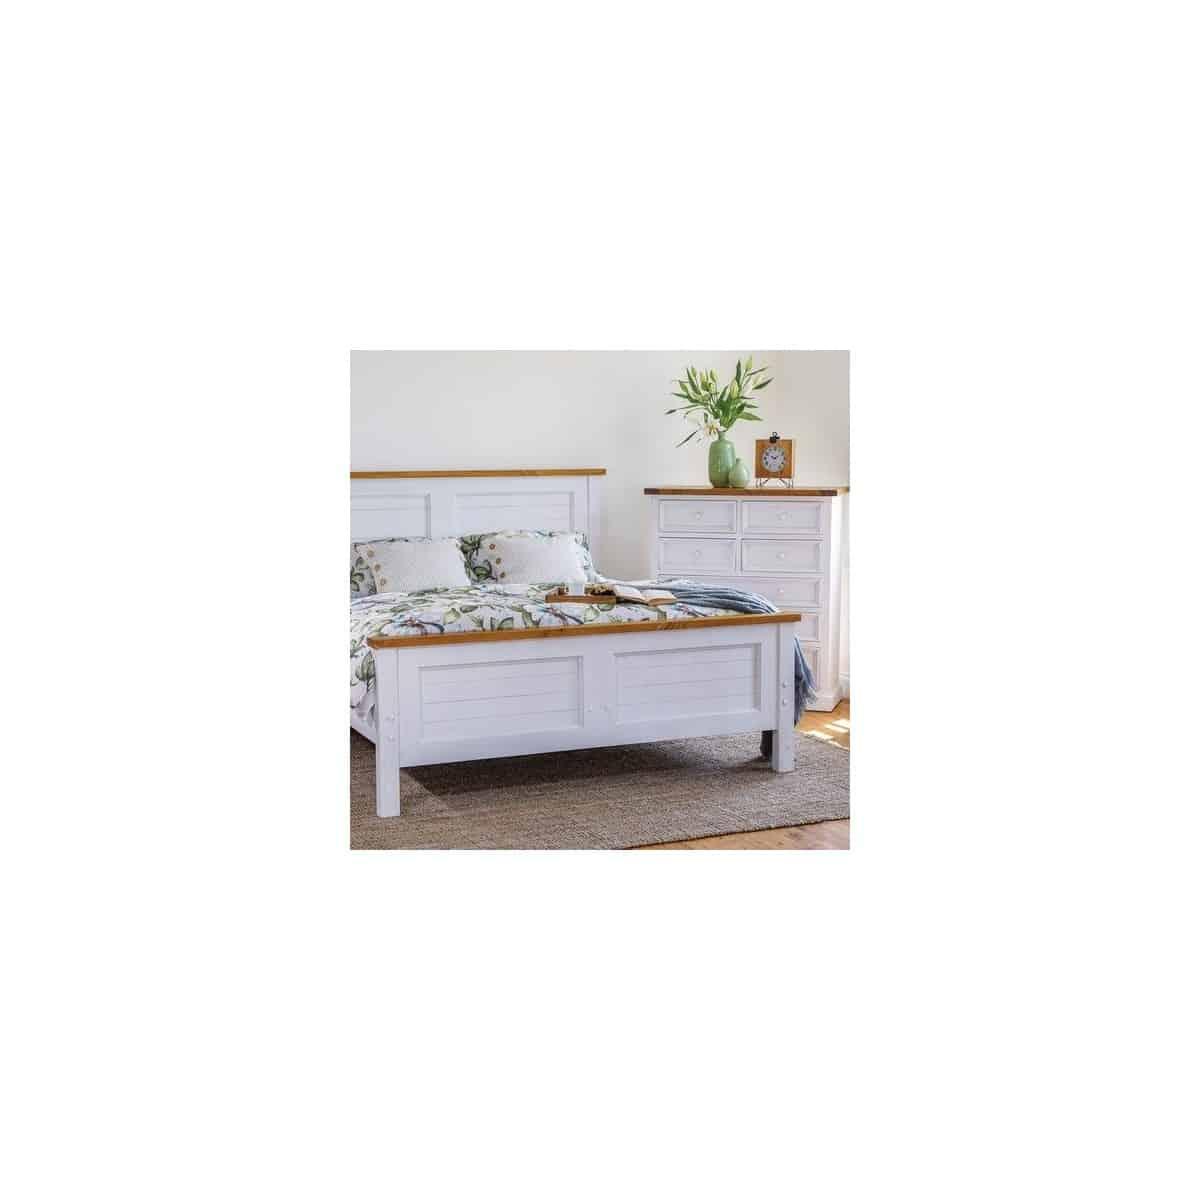 Commode 7 Tiroirs Bois Blanc 108x45x122cm